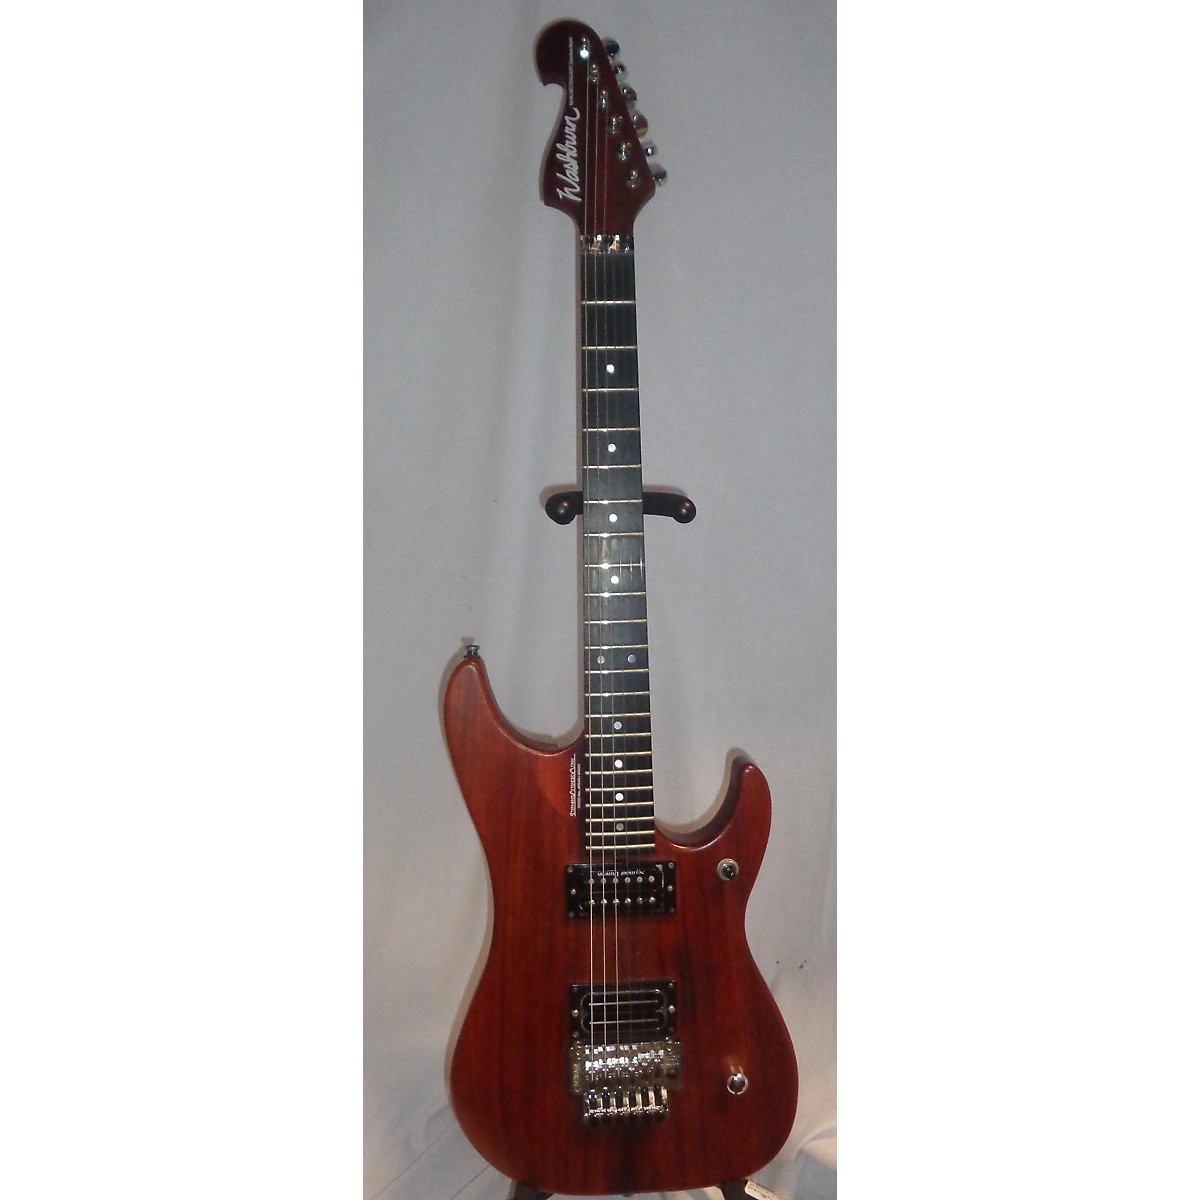 Washburn 2005 Nuno Bettencourt Signature N4 USA Solid Body Electric Guitar